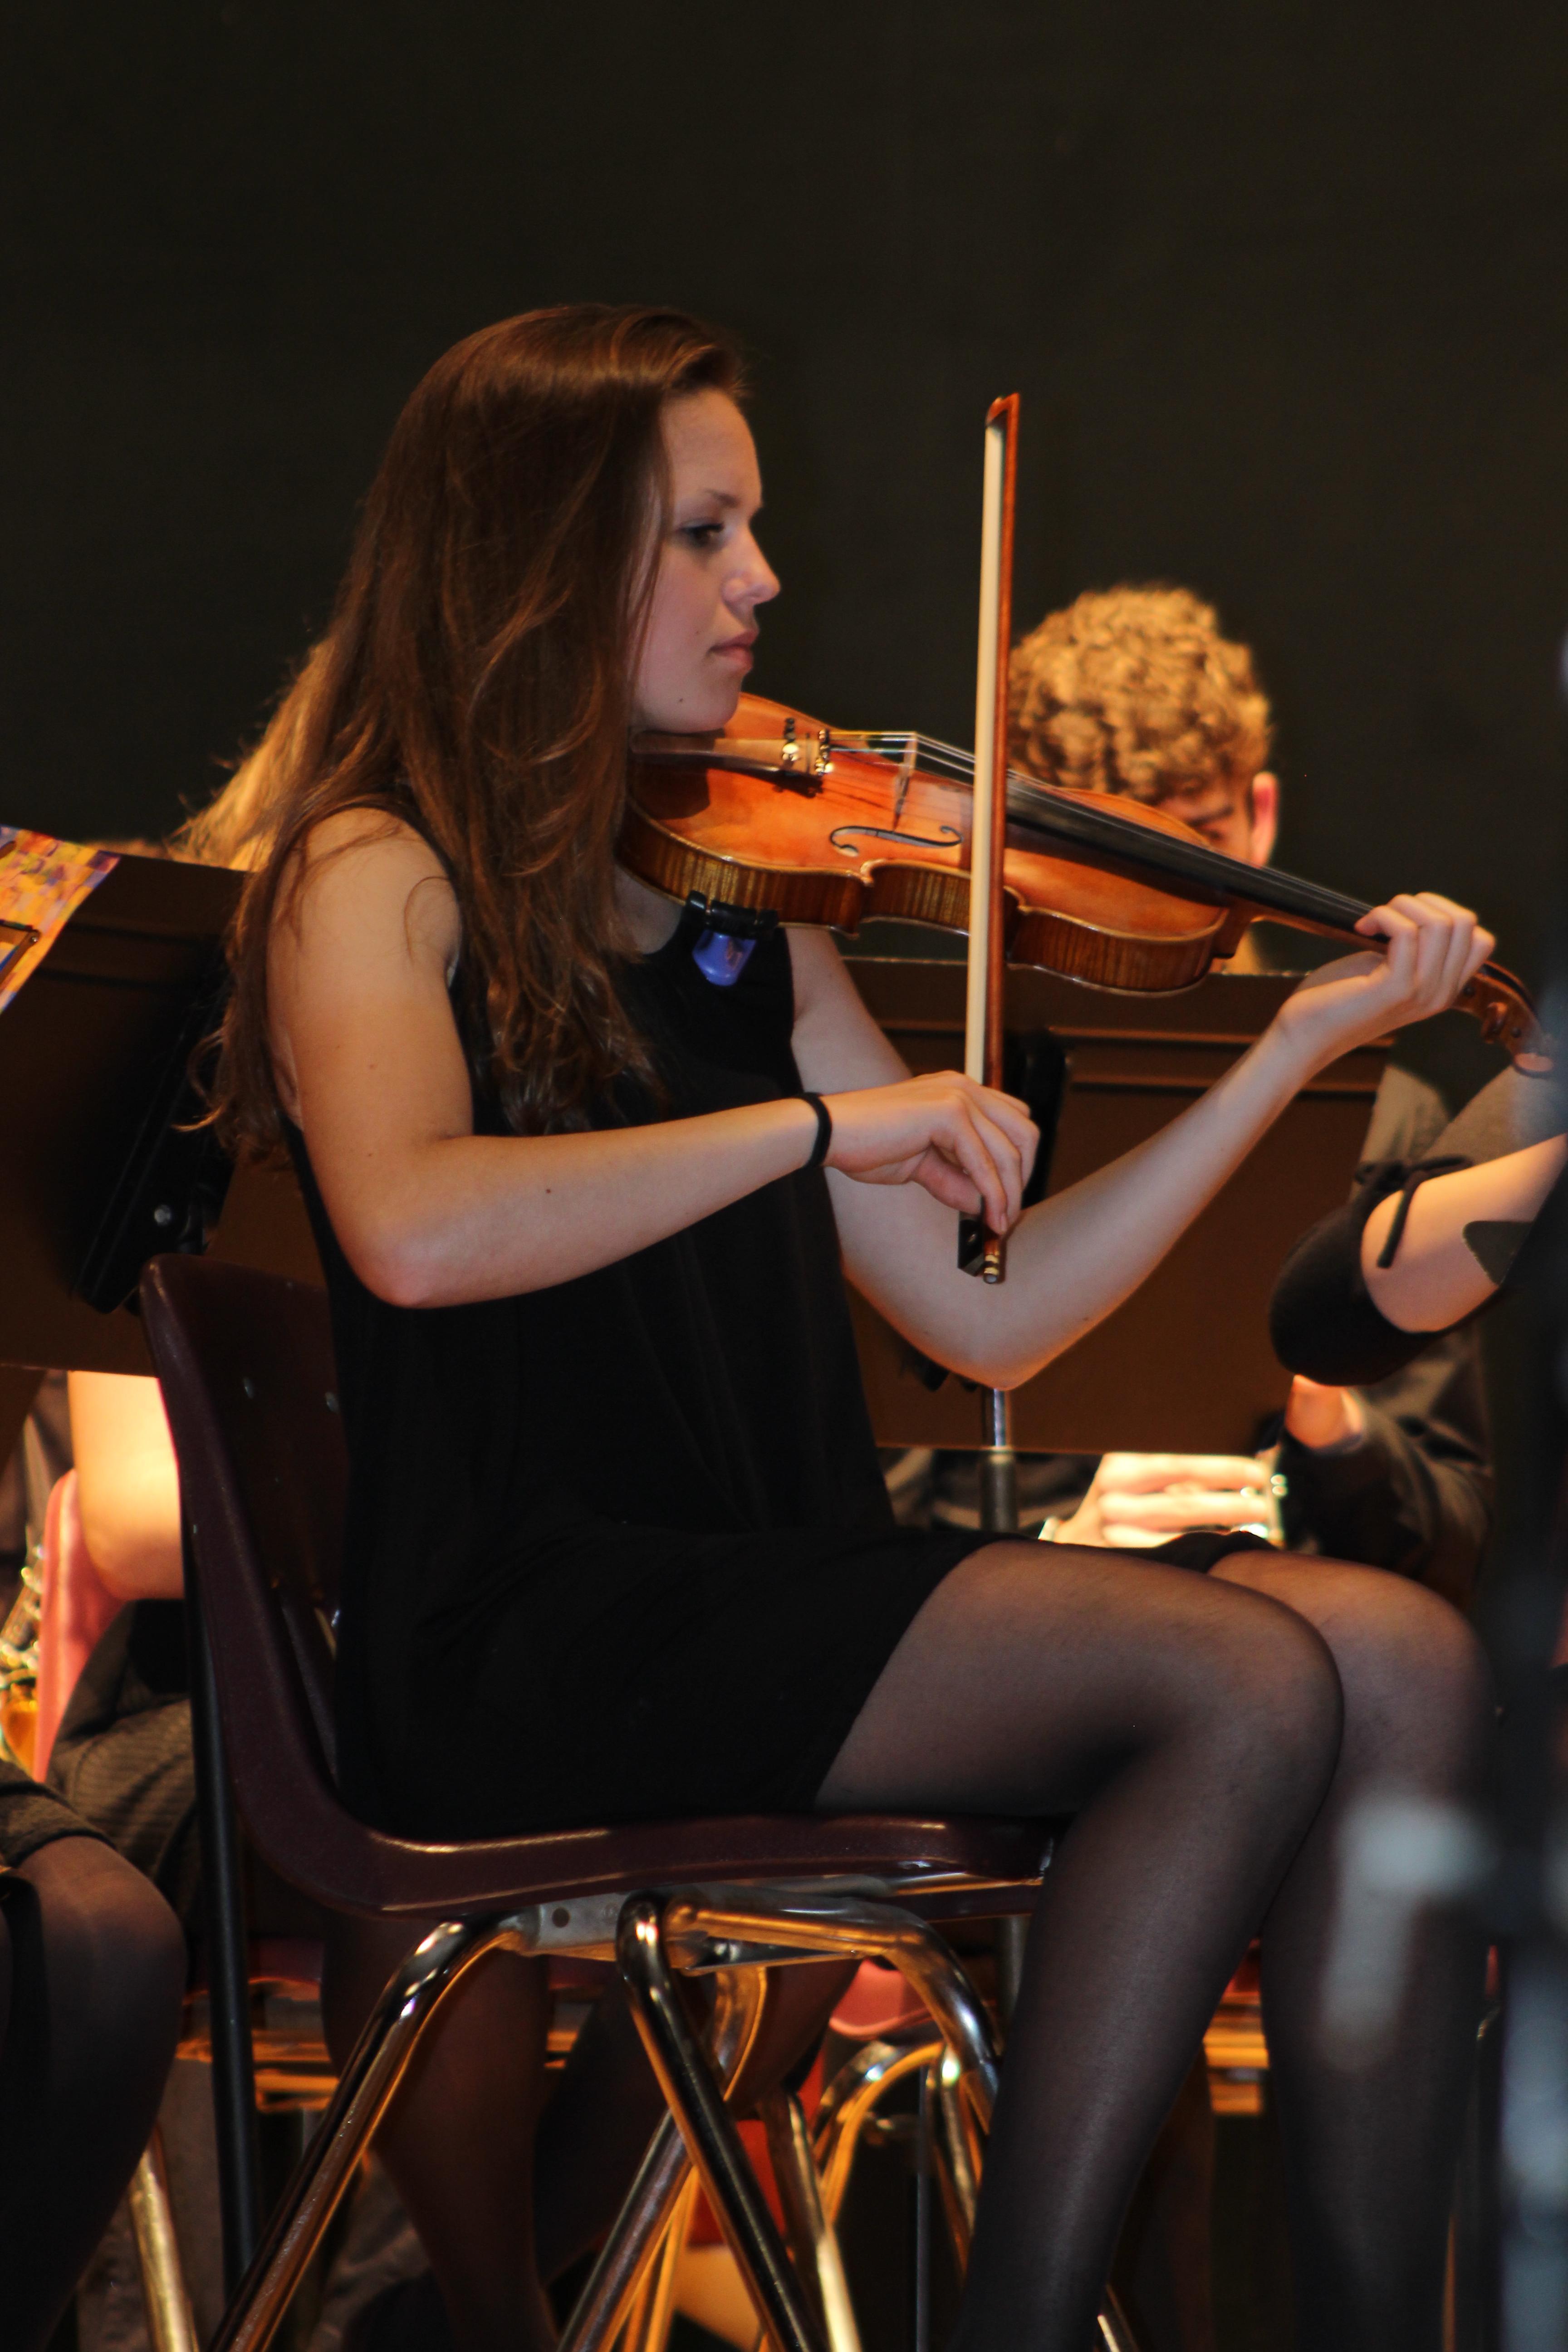 Violinist playing